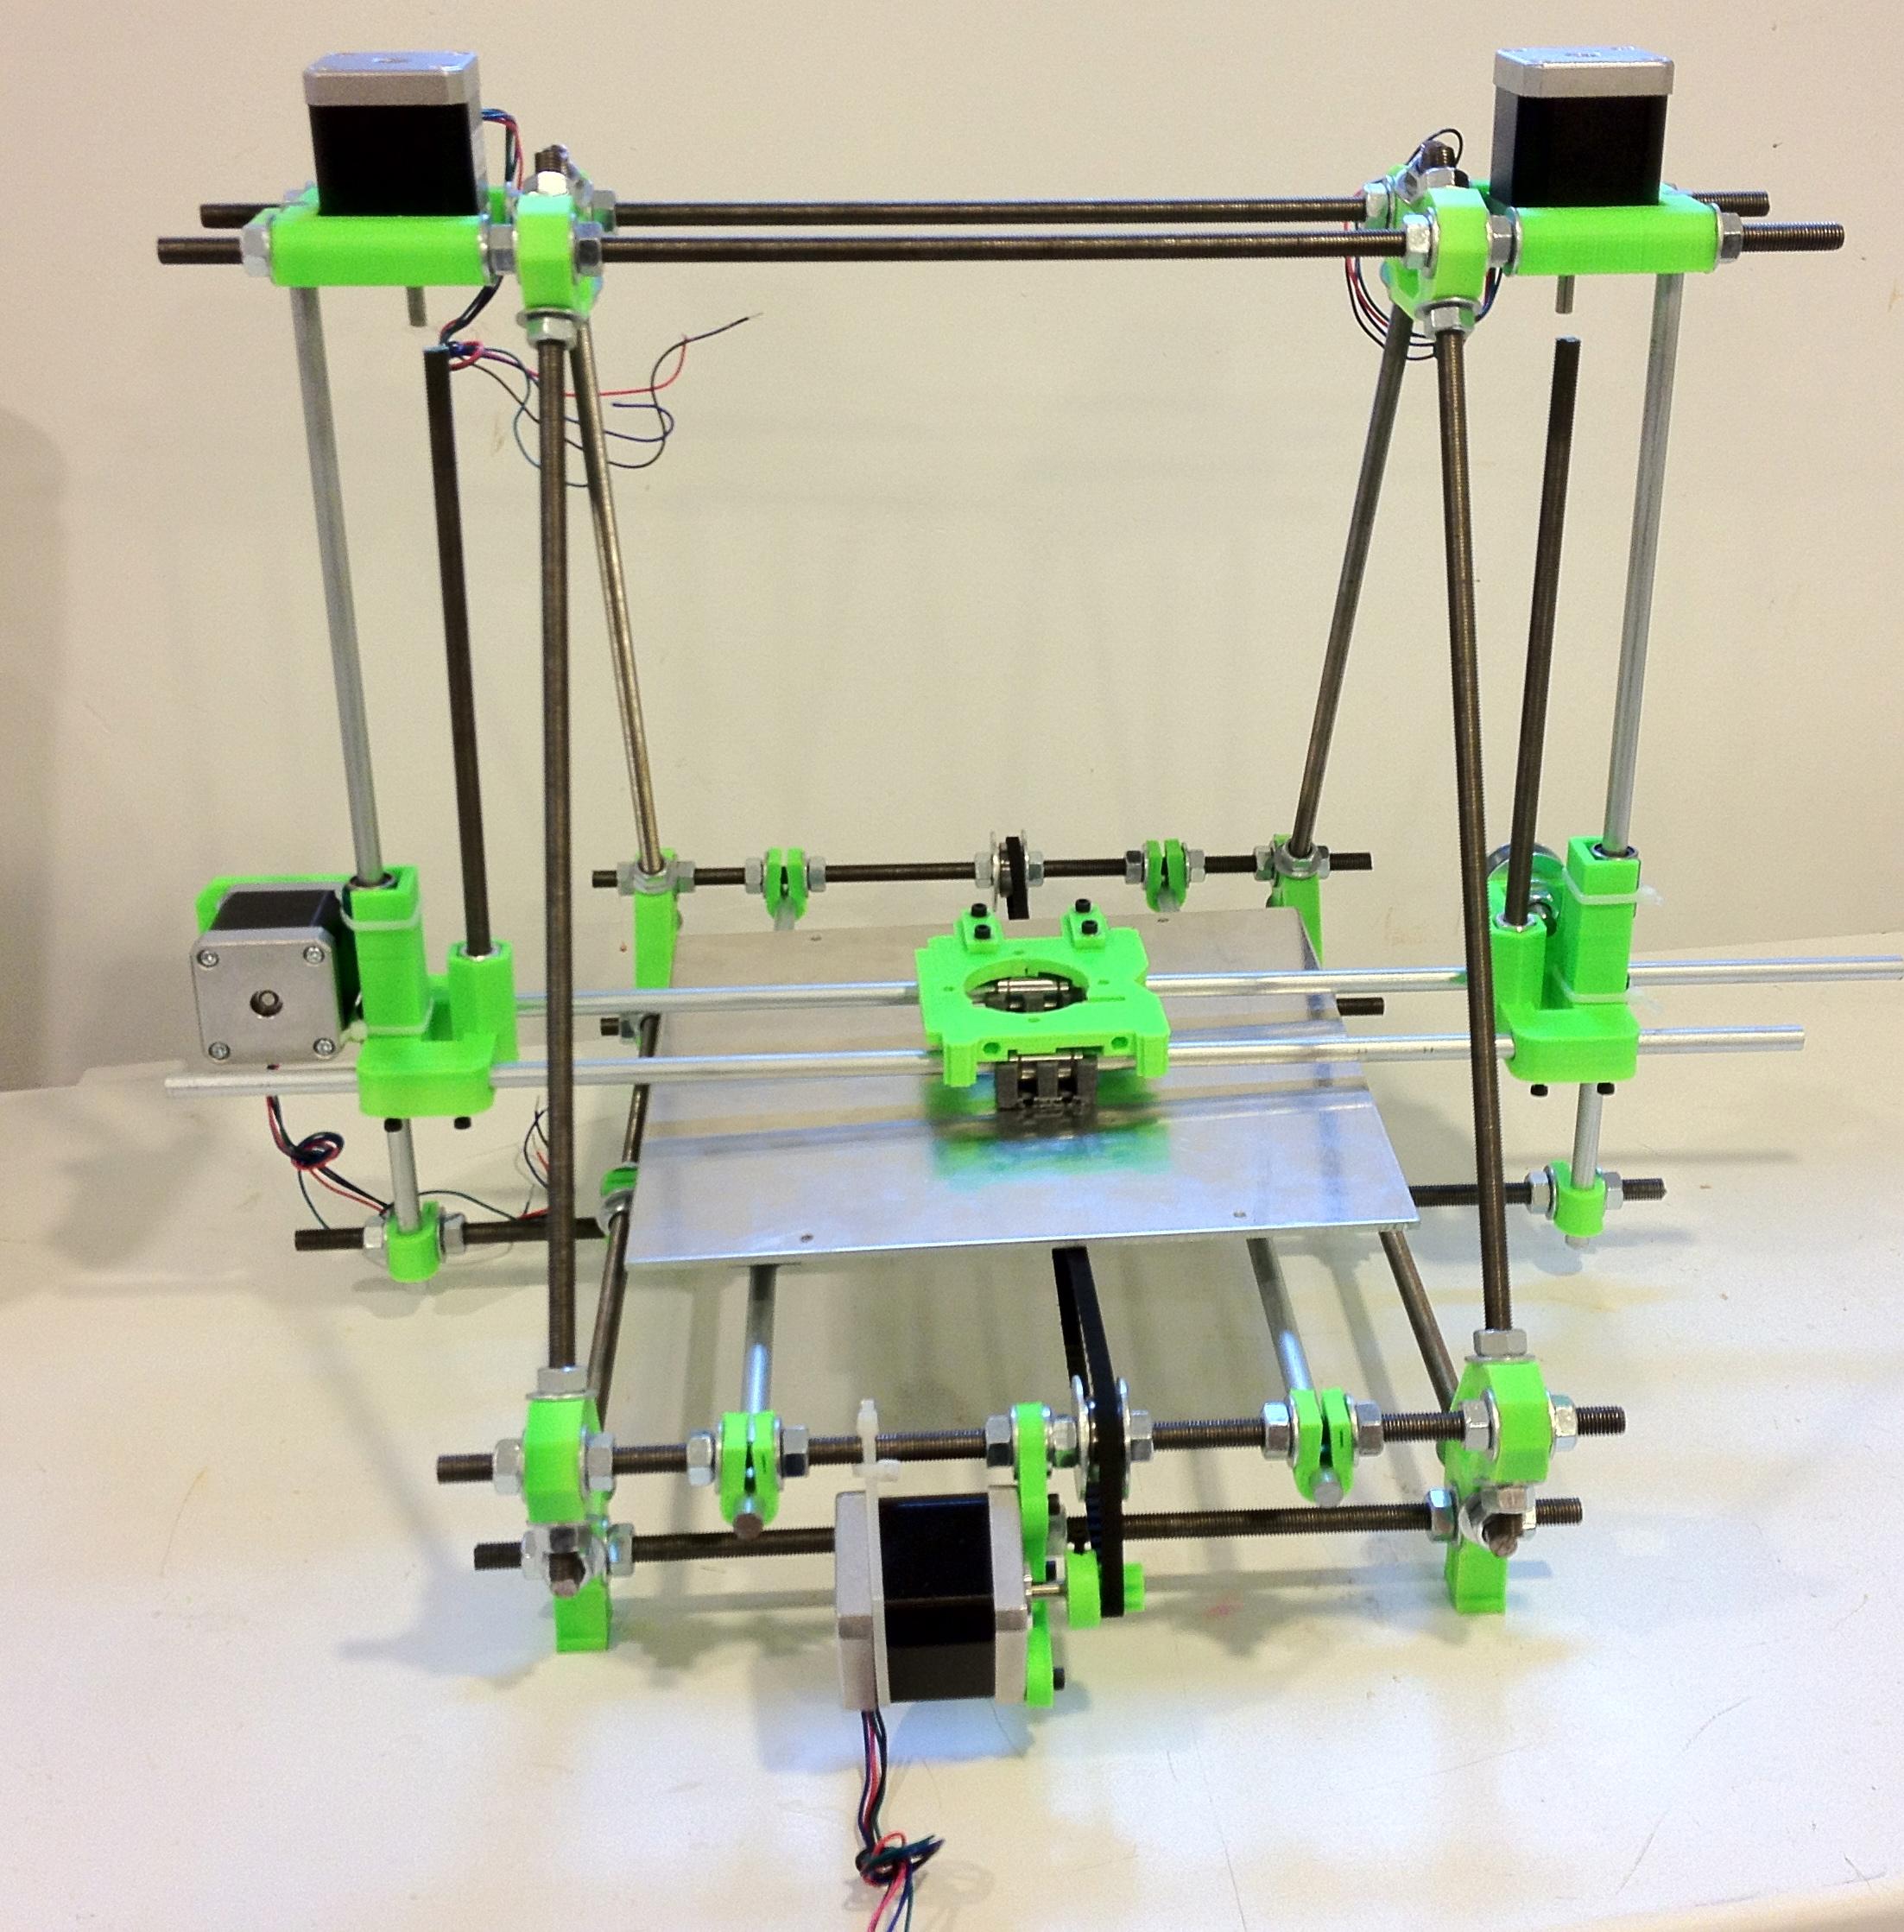 FinkrBot: a RepRap Prusa Mendel 3D Printer built by yours truly.